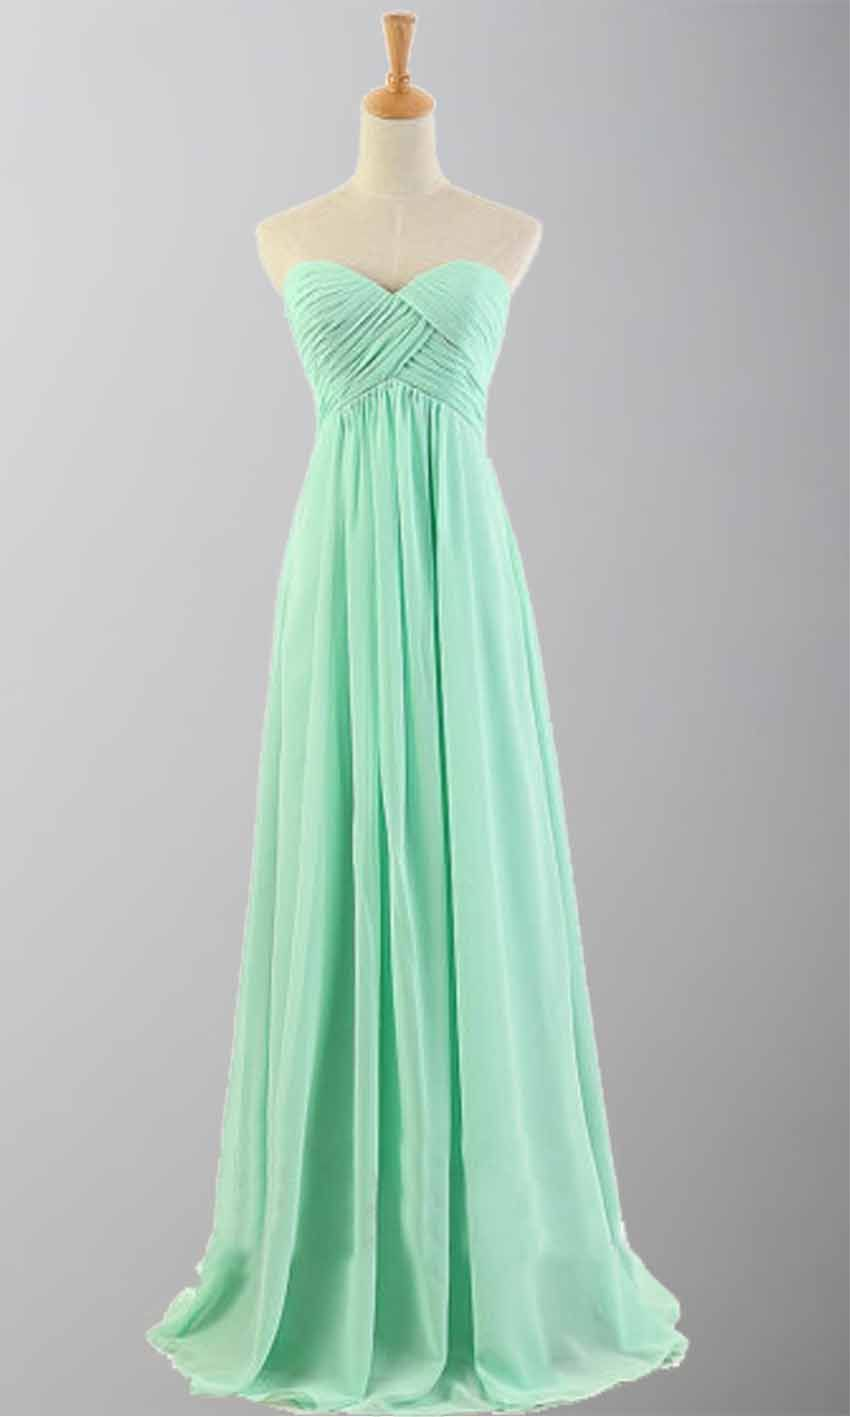 Mint green cross pleated long bridesmaid dresses ksp171 prom mint green cross pleated long bridesmaid dresses ksp171 ombrellifo Choice Image